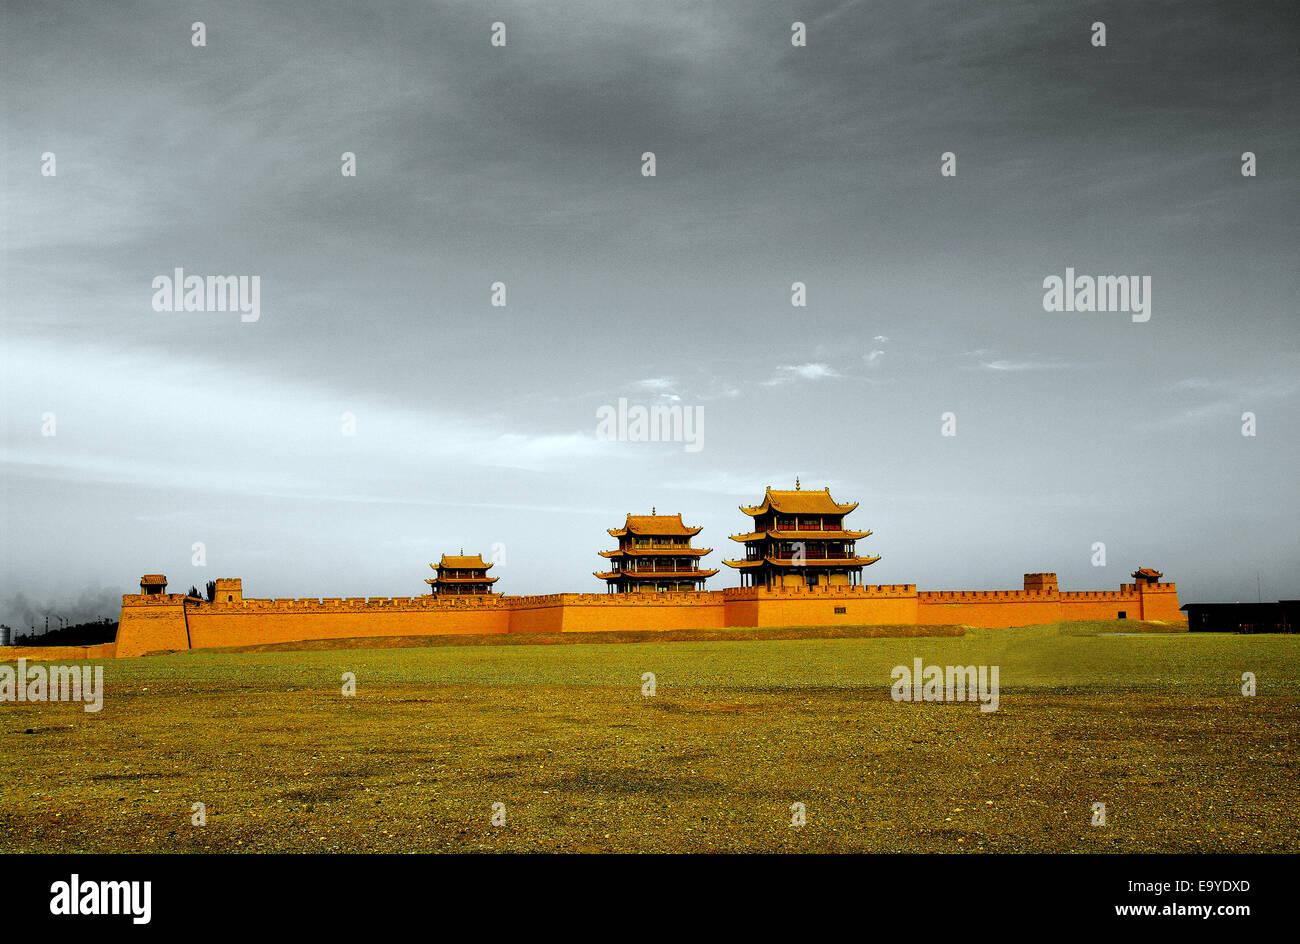 Jiayuguan, Gansu Province - Stock Image